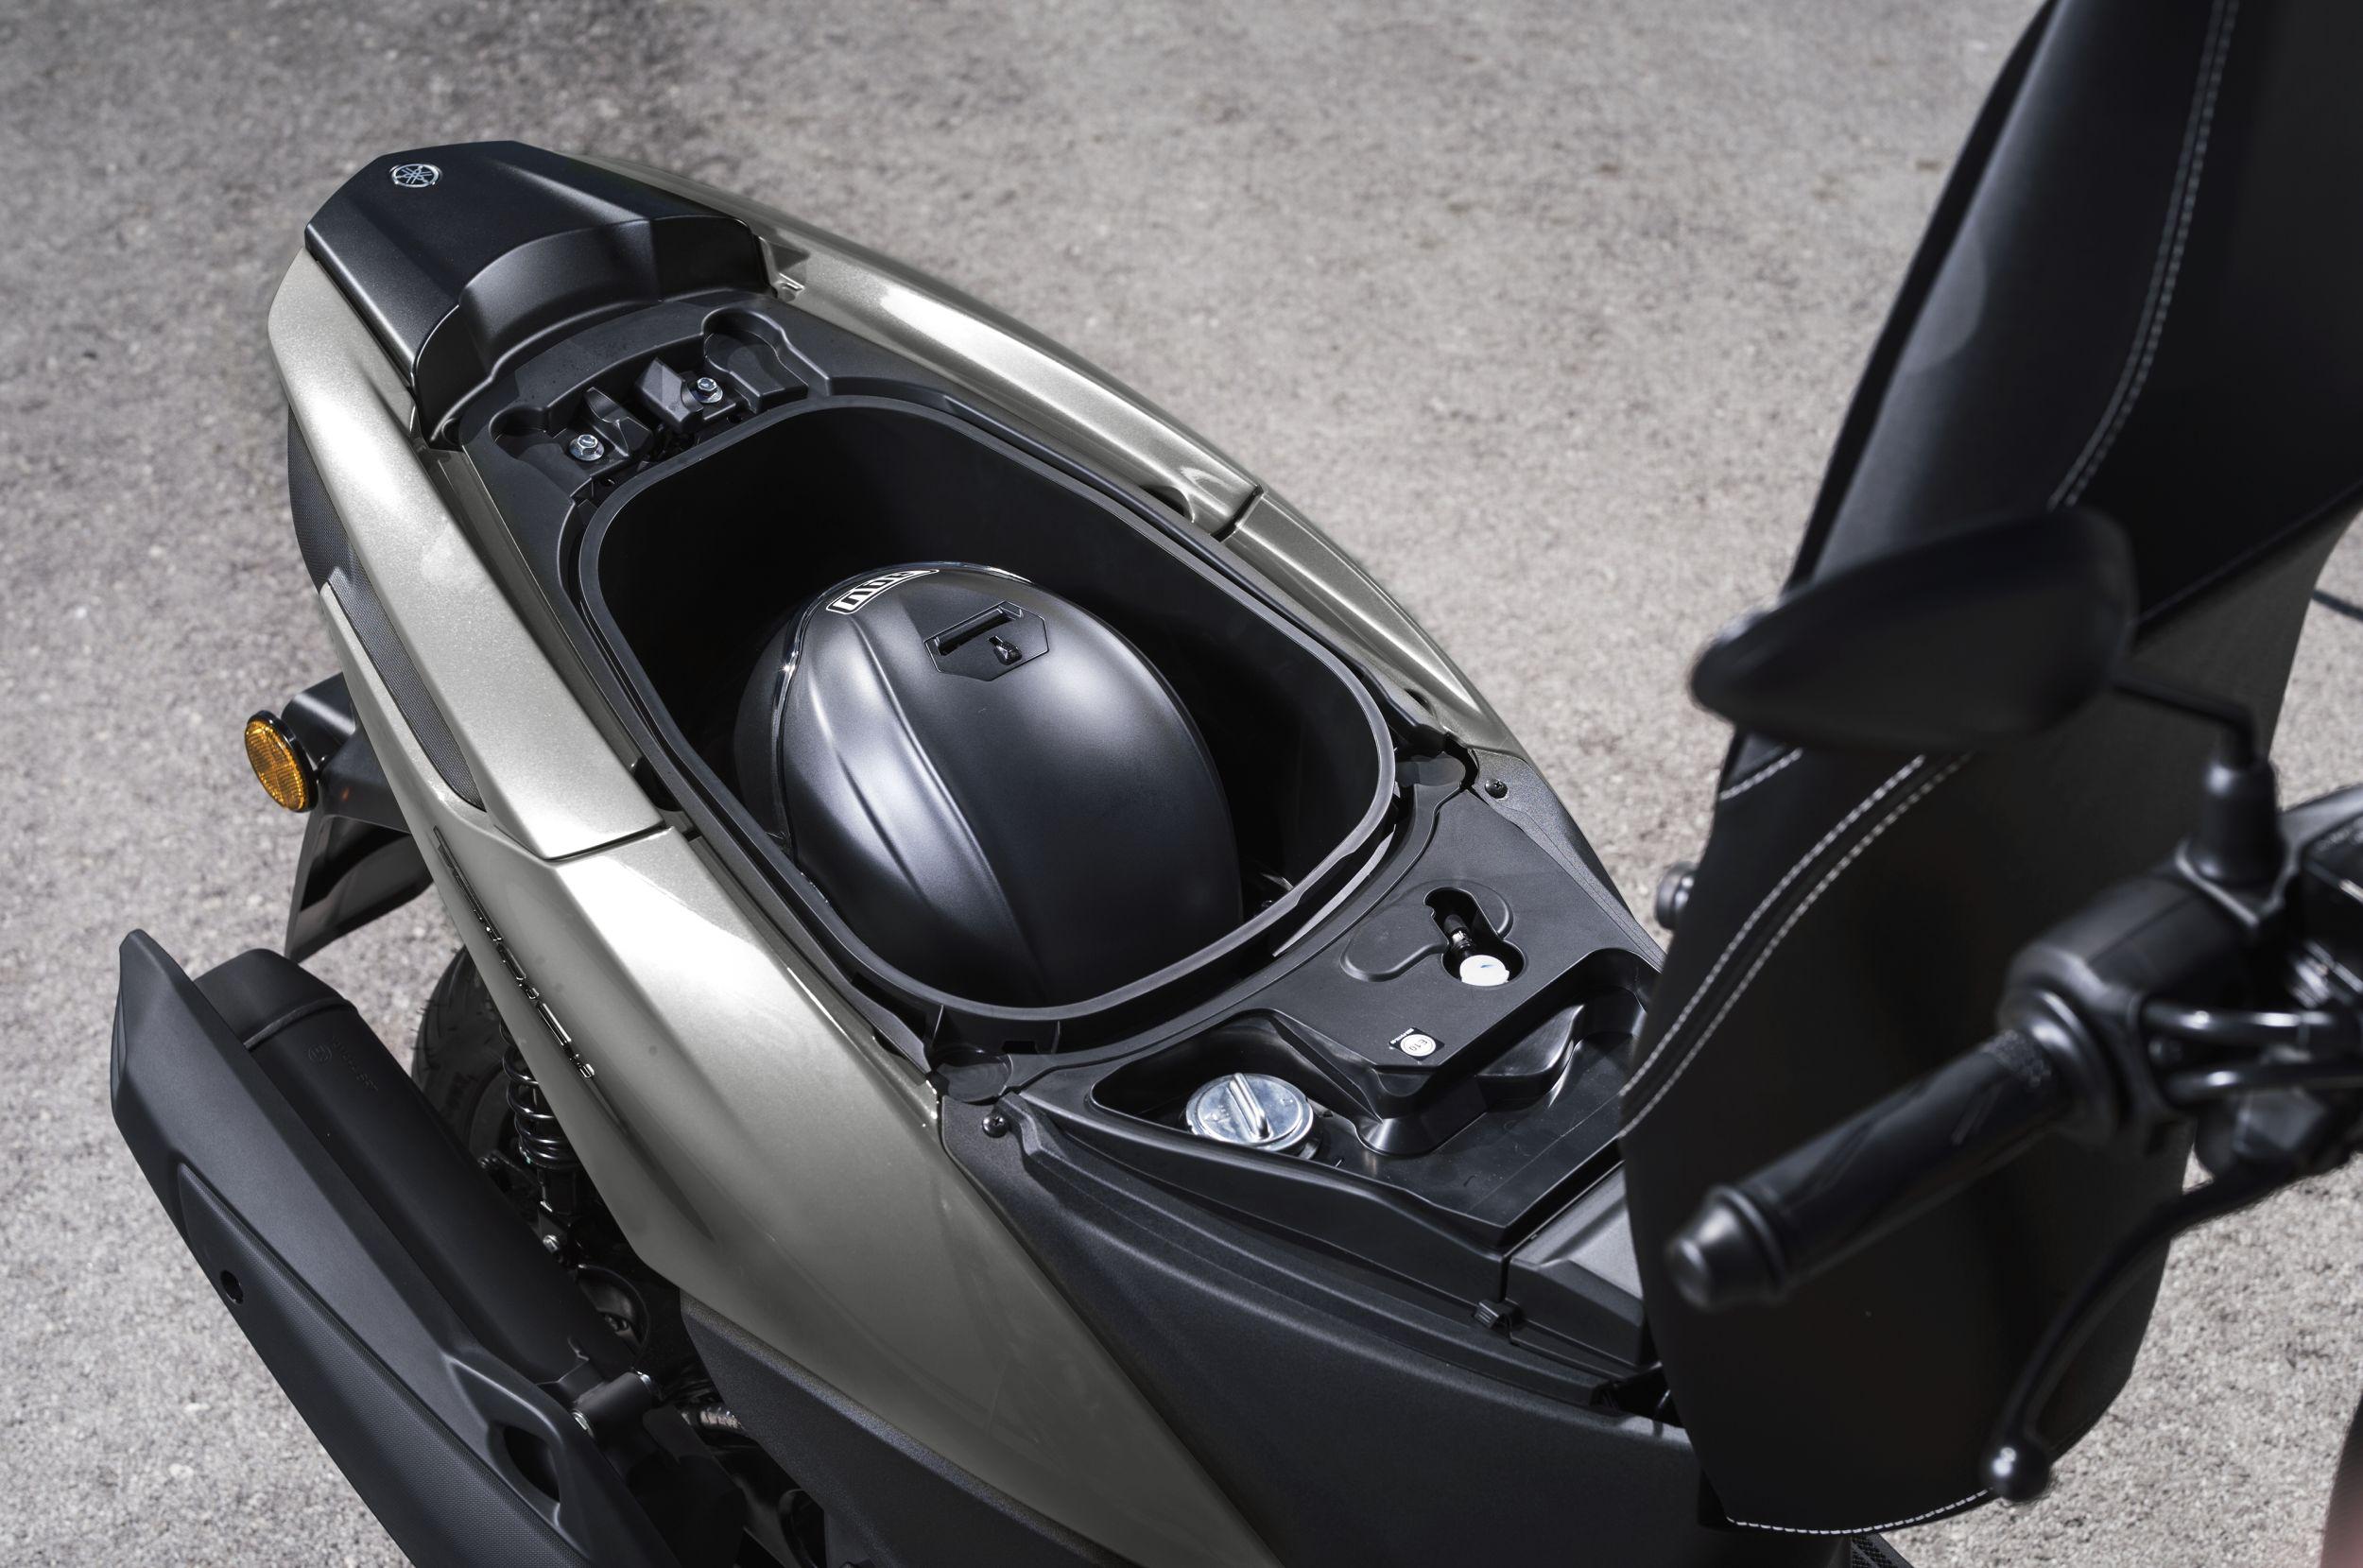 motorrad occasion yamaha tricity 125 kaufen. Black Bedroom Furniture Sets. Home Design Ideas